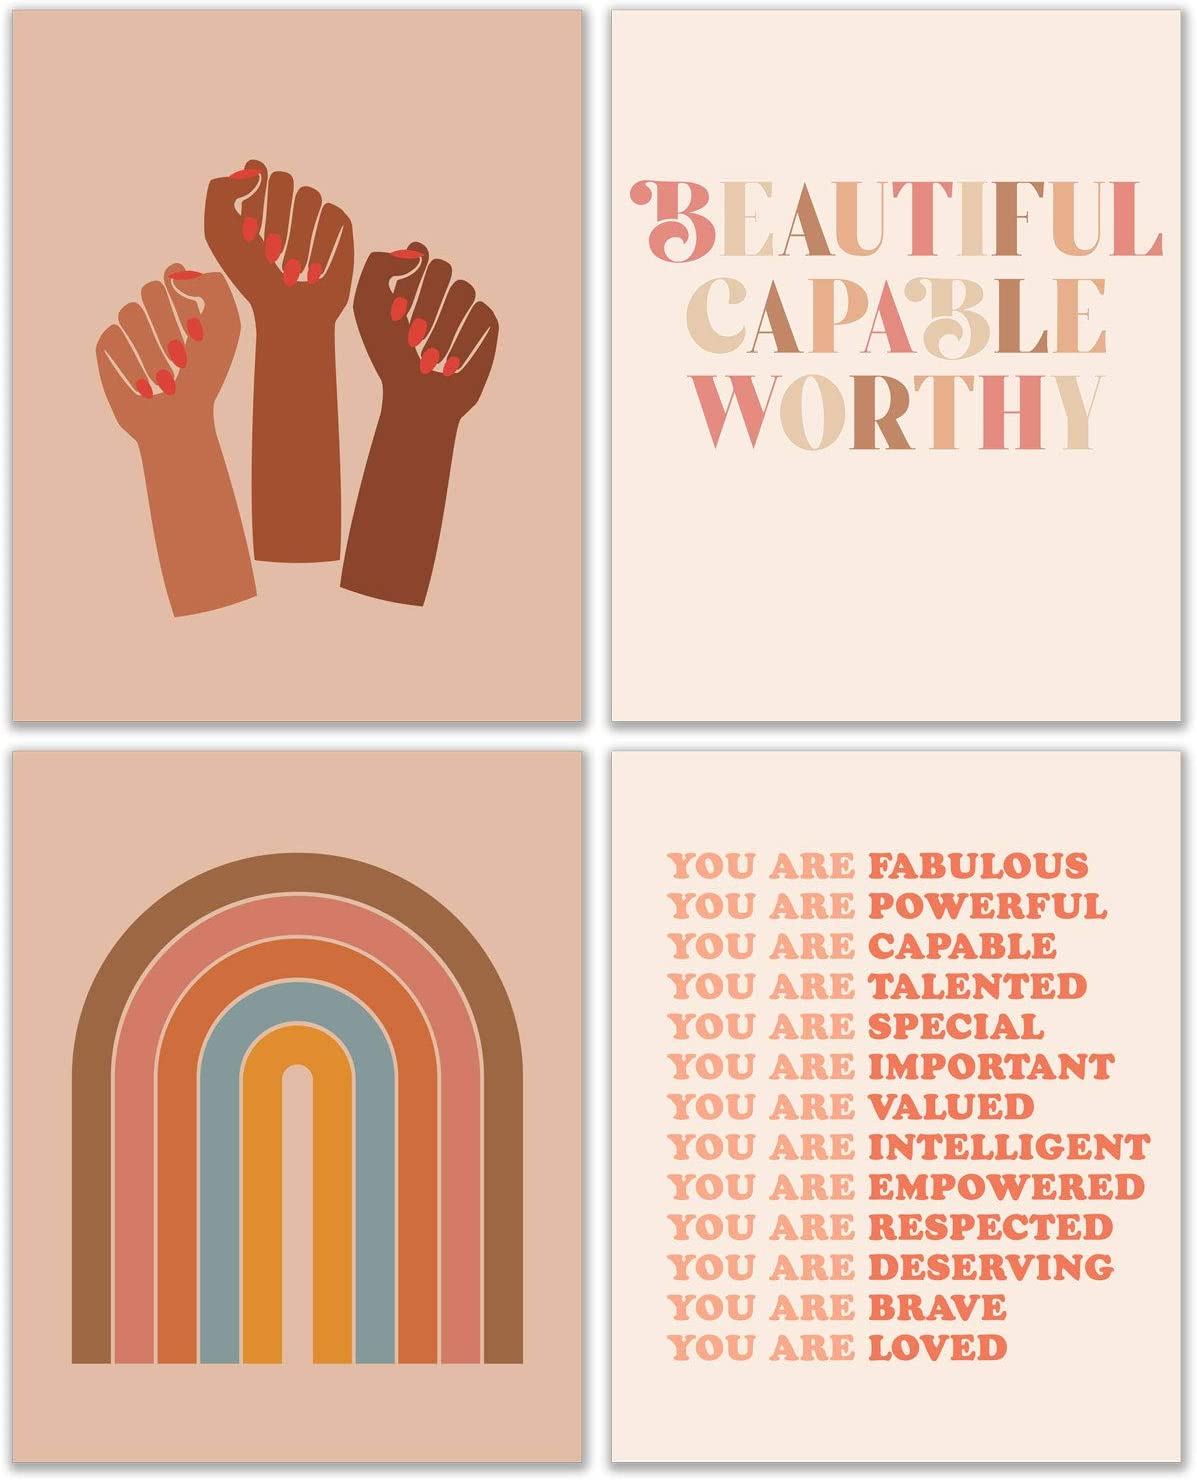 Retro Feminism Wall Art Decor - Positive Affirmations - Women Empowerment Artwork - Female Inspirational & Motivational Poster Prints - Girls Room - Power Fist - Set of 4 (8x10 Inch)